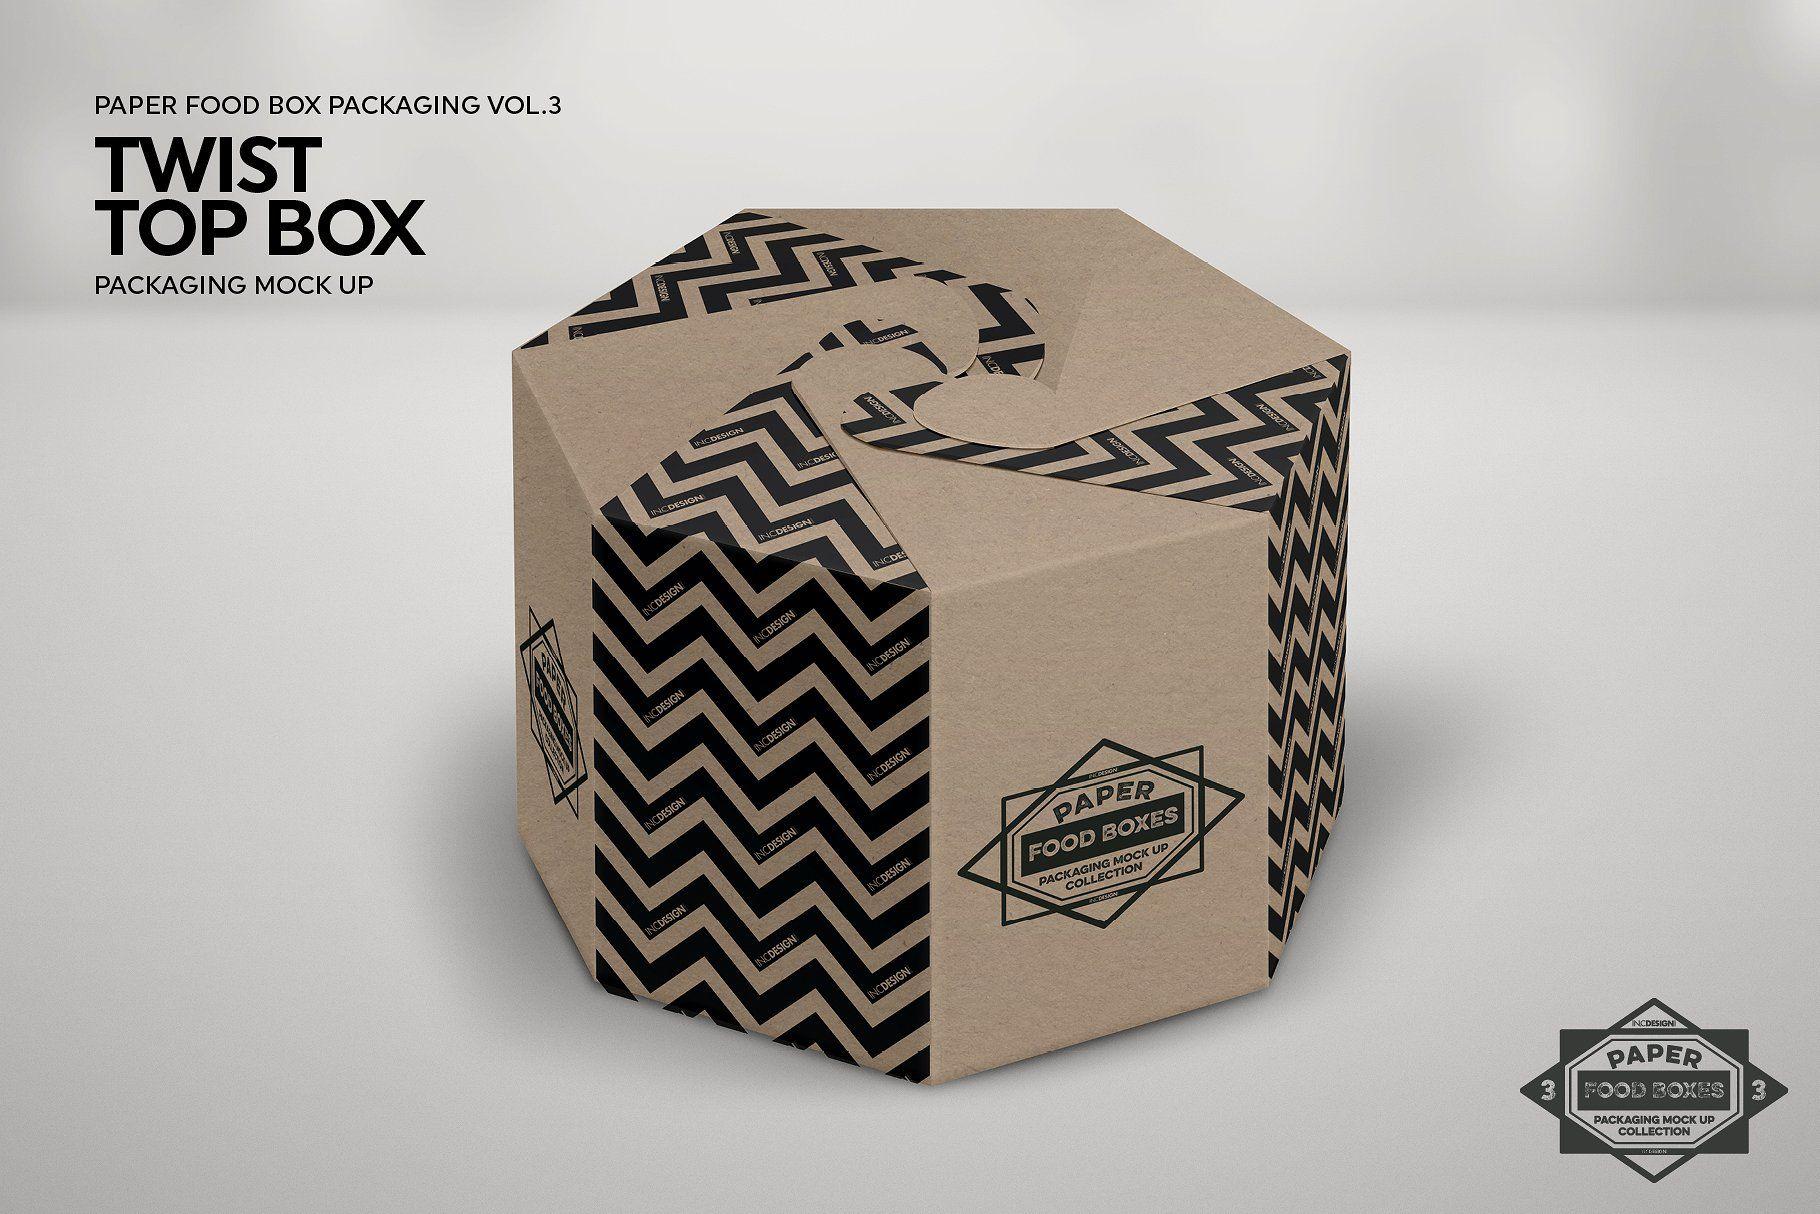 Download Vol 3 Food Box Packaging Mockups Packaging Mockup Stationery Mockup Business Card Mock Up